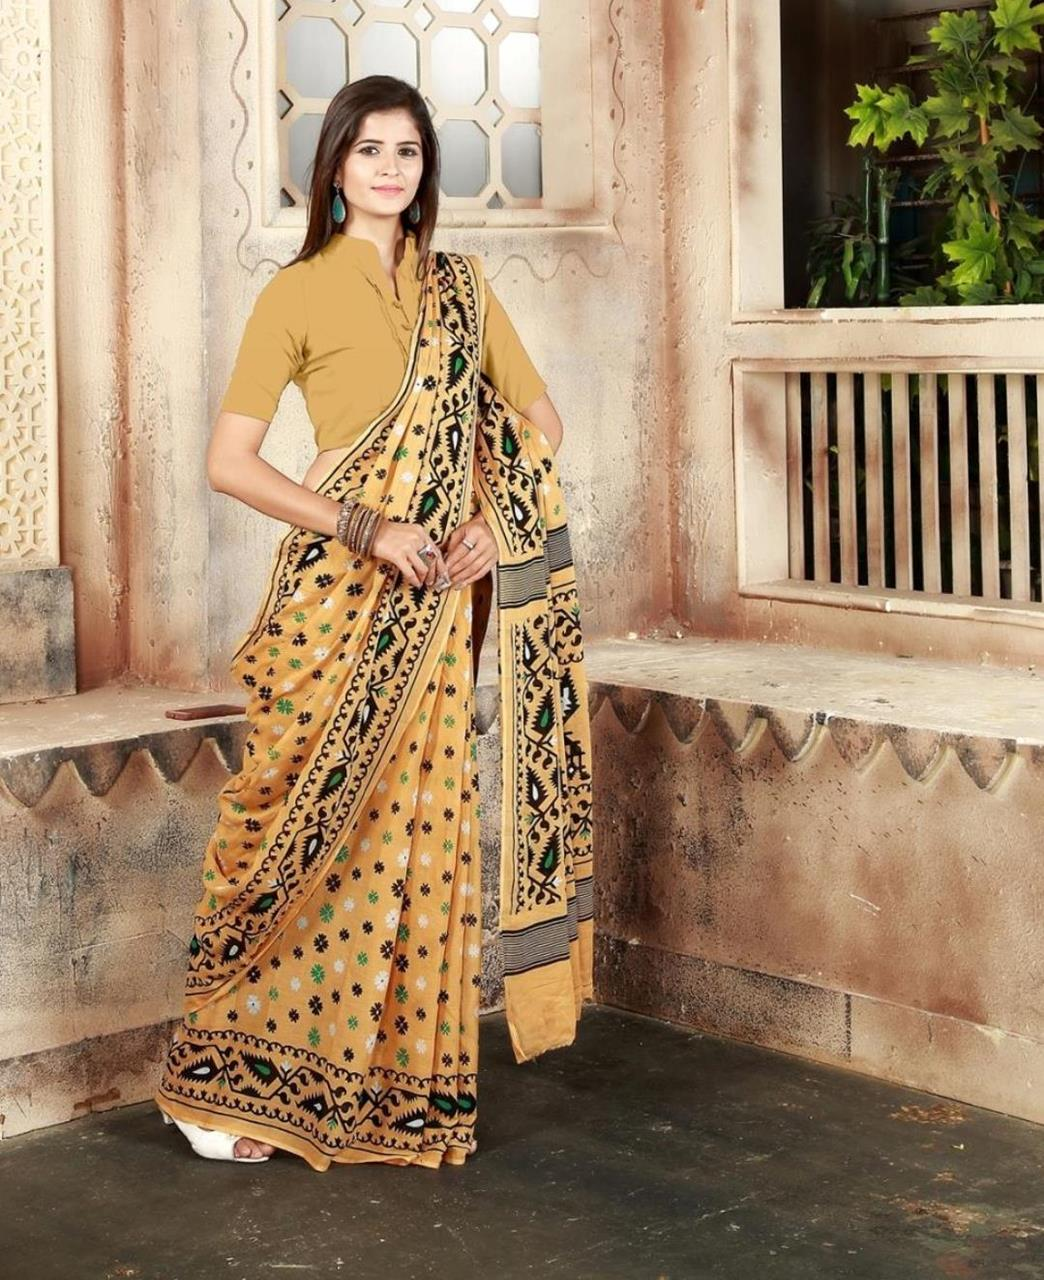 Printed Cotton Saree (Sari) in Yellow